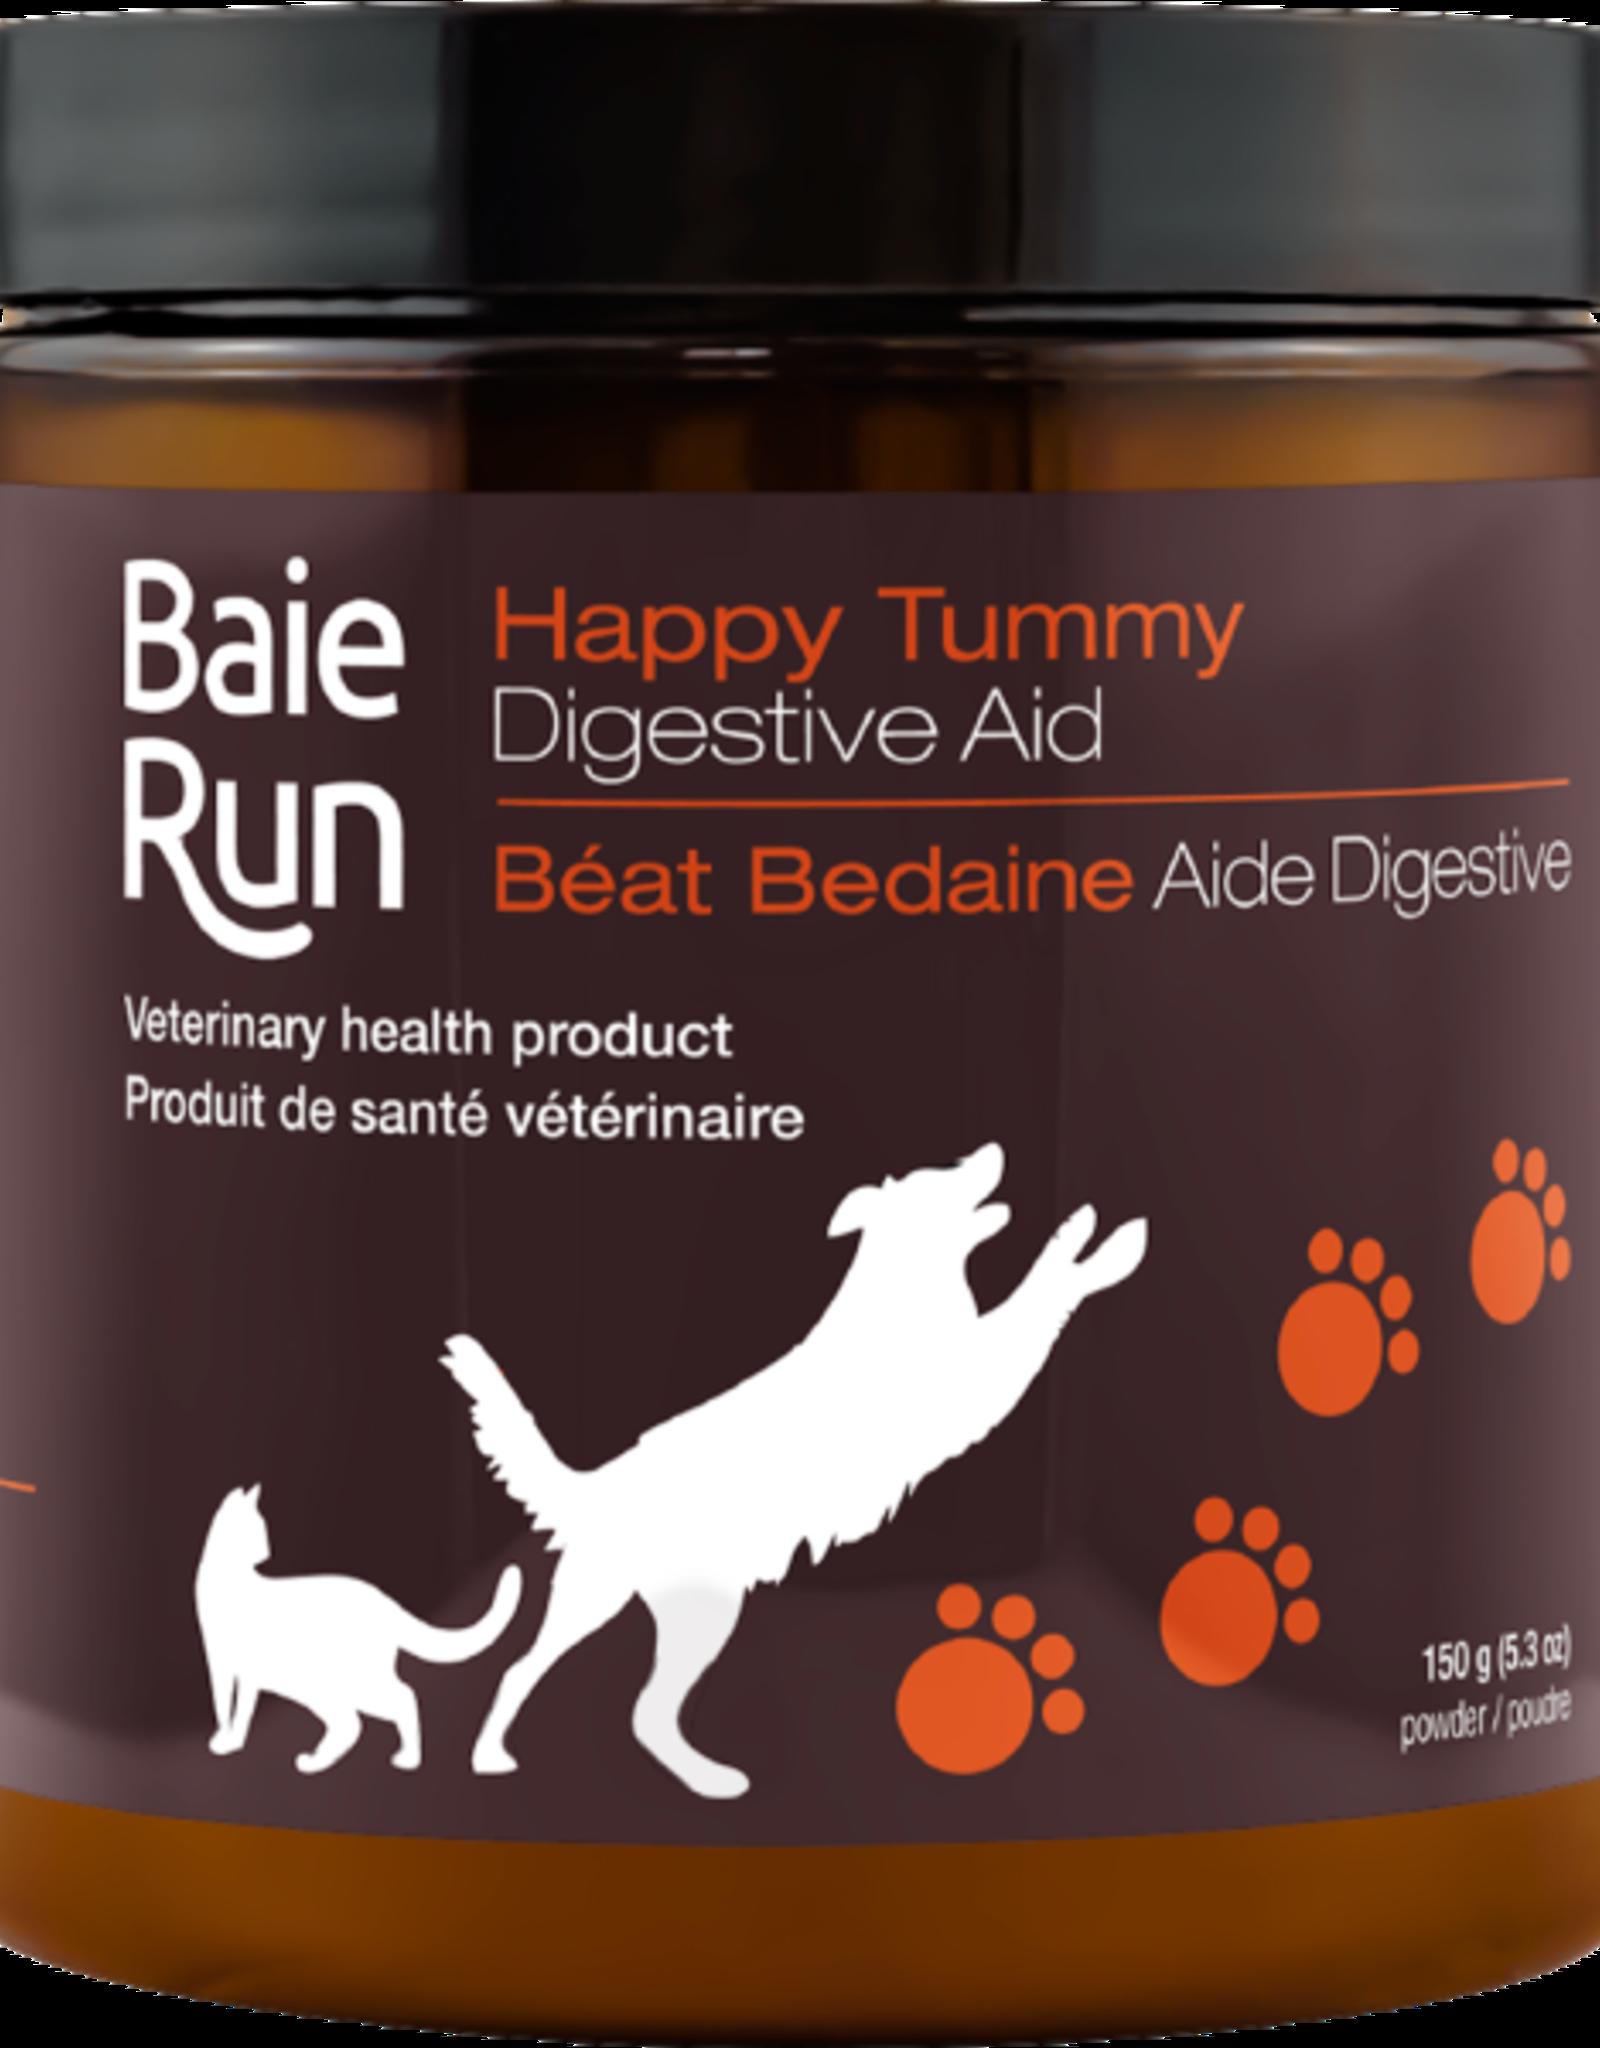 Baie Run Baie Run Dog/Cat Happy Tummy Digestive Aid 150g